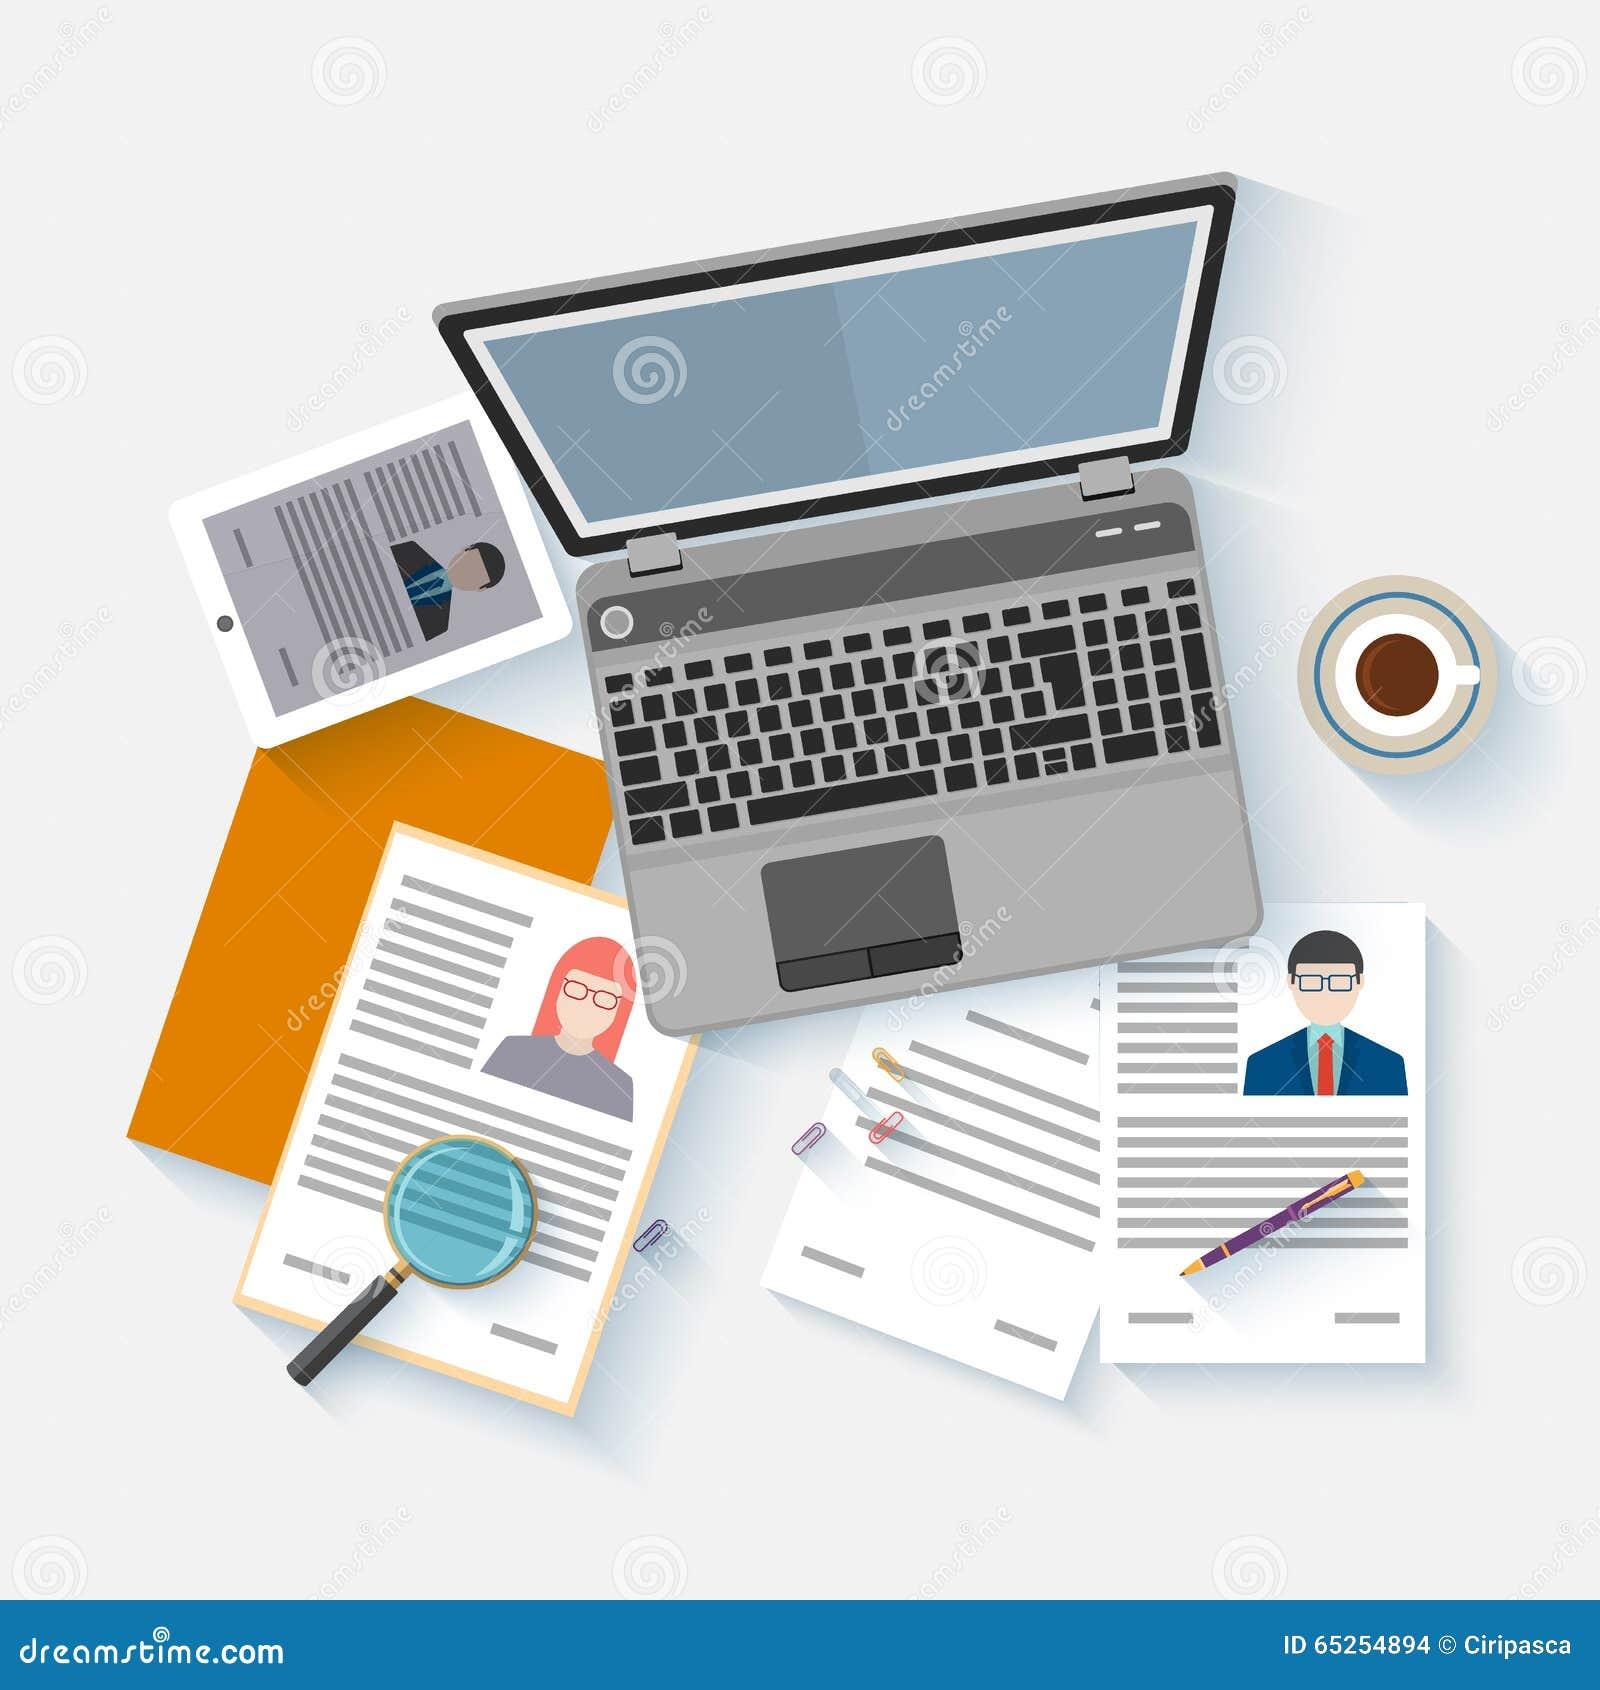 Human Resource Documents Curriculum Vitae Stock Vector - Image ...